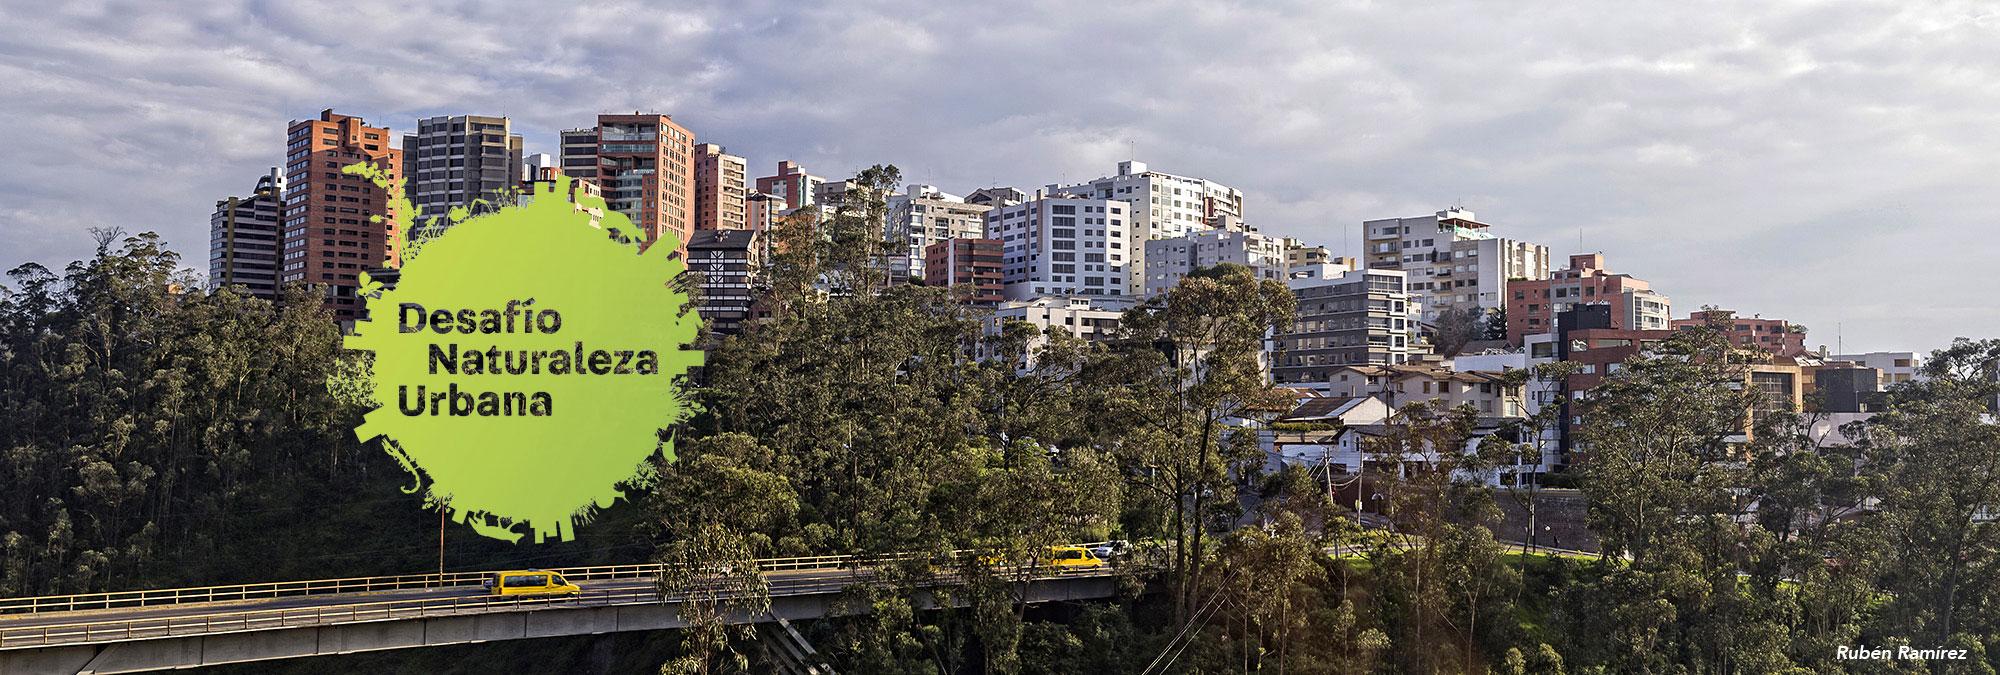 Desafio Naturaleza Urbana